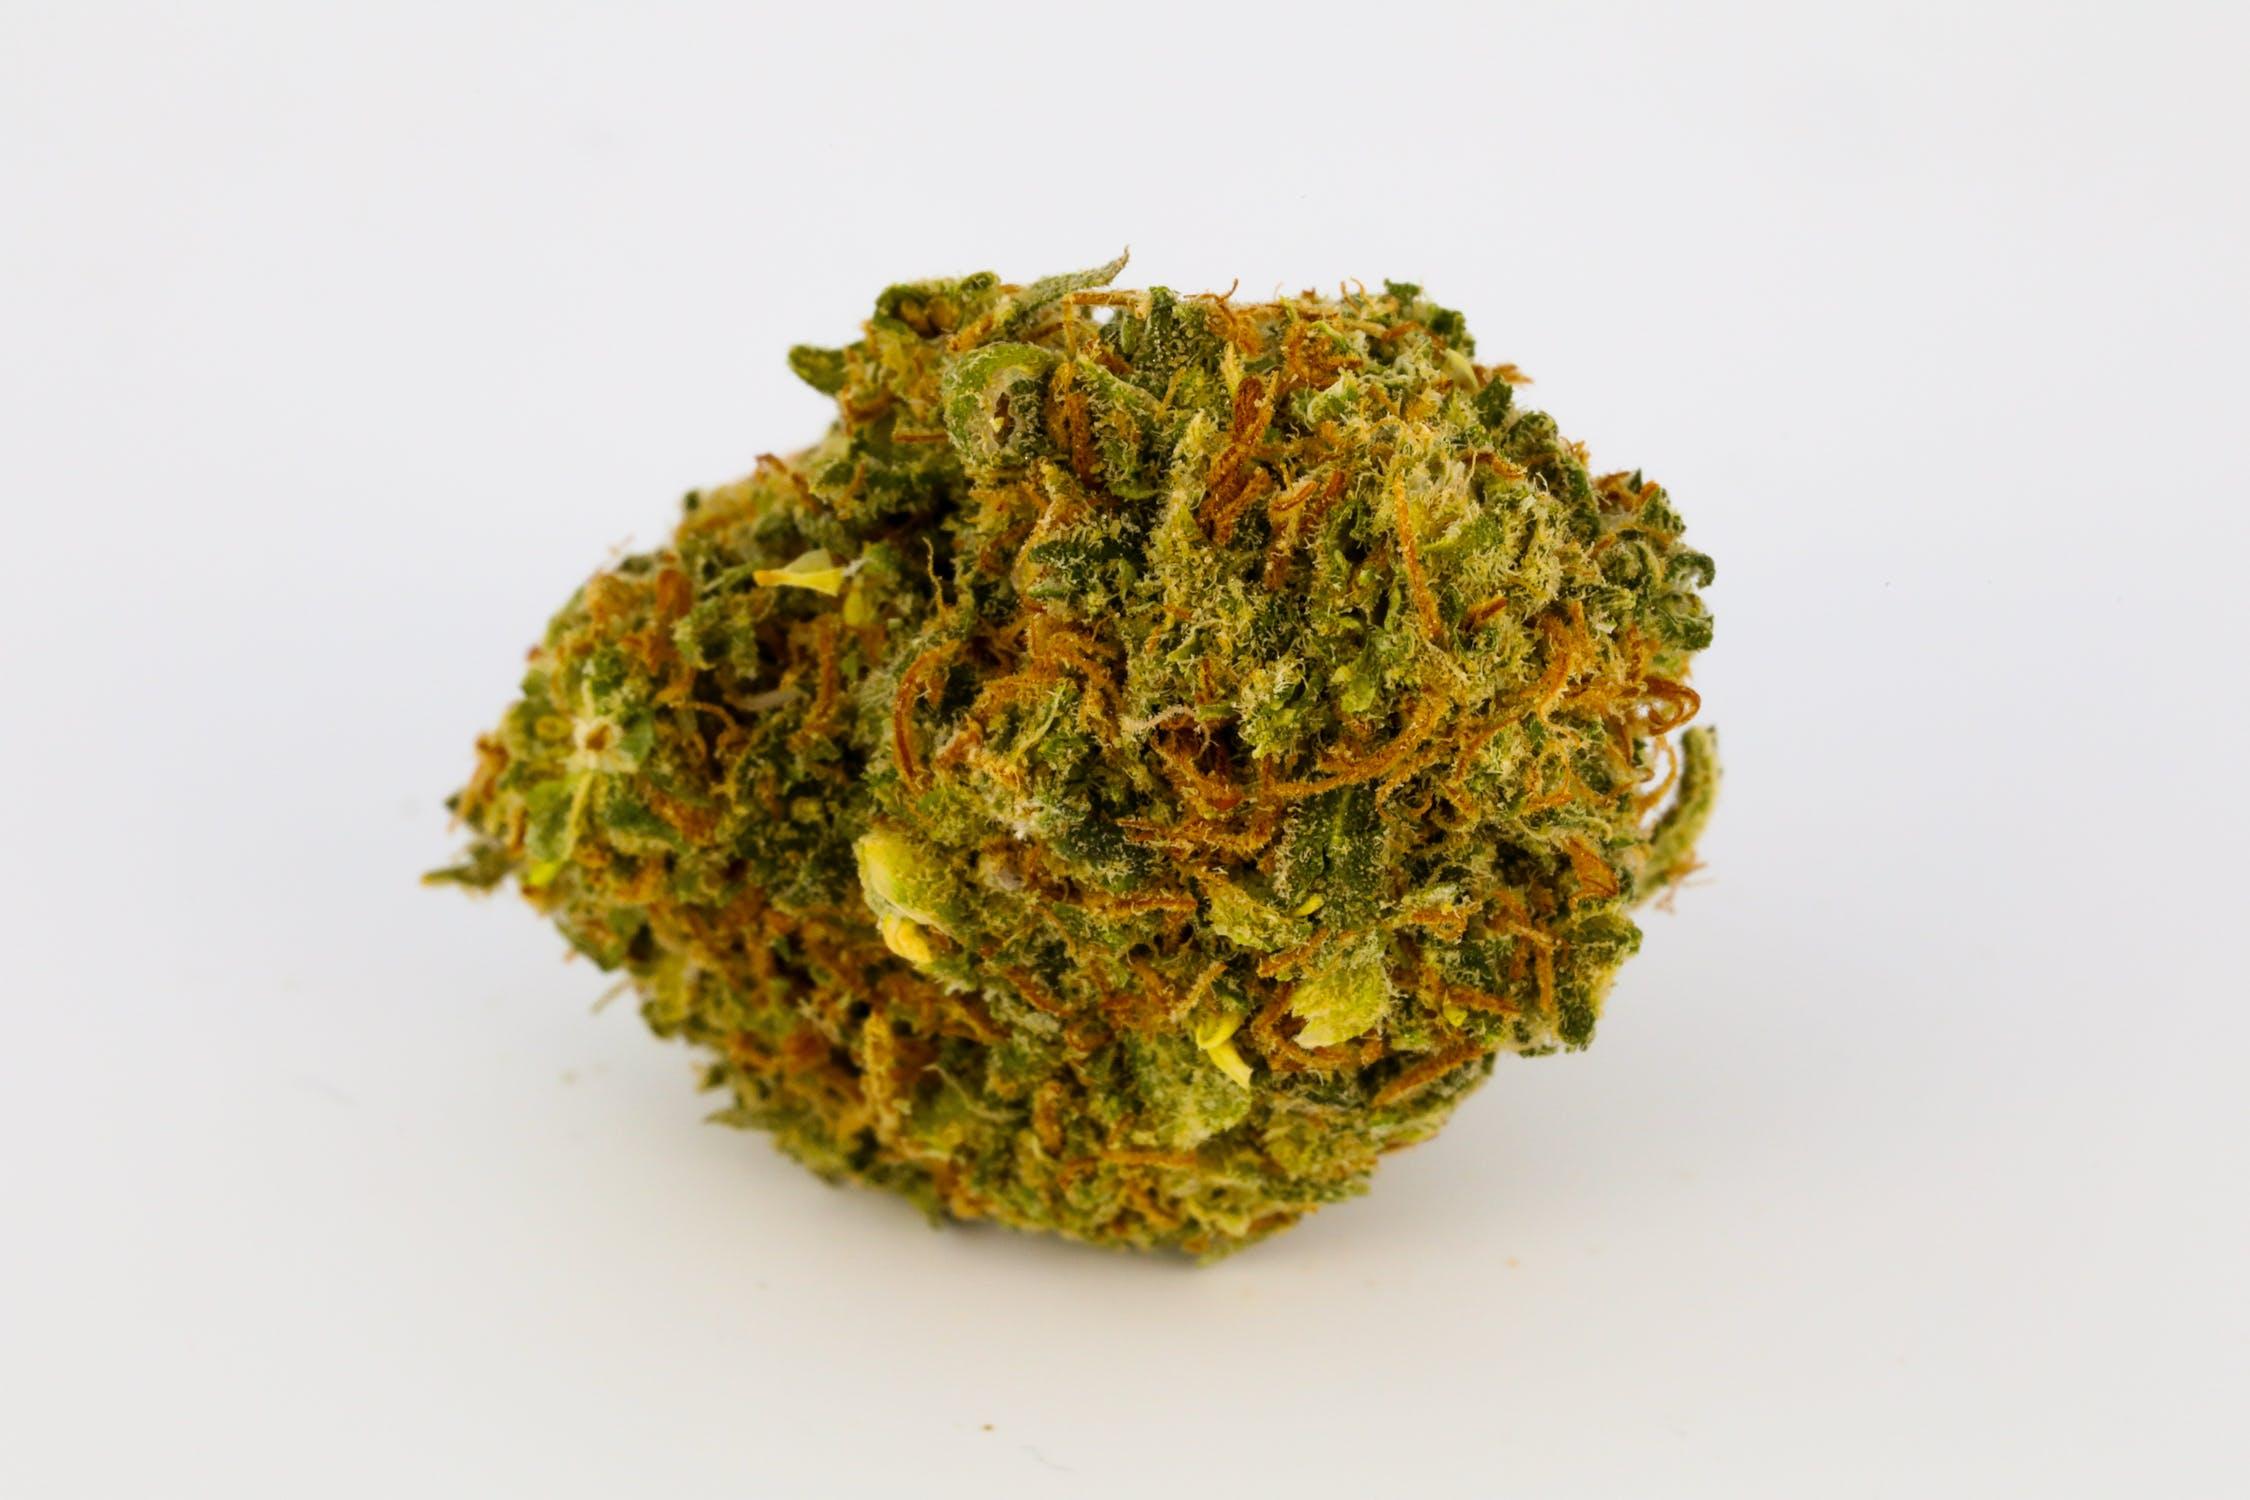 Snoop's Dream Weed; Snoop's Dream Cannabis Strain; Snoop's Dream Hybrid Marijuana Strain